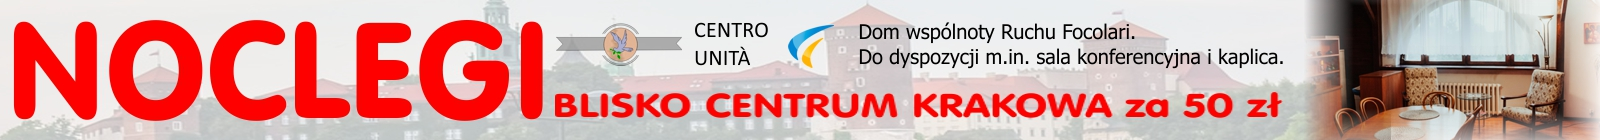 Centro Unita